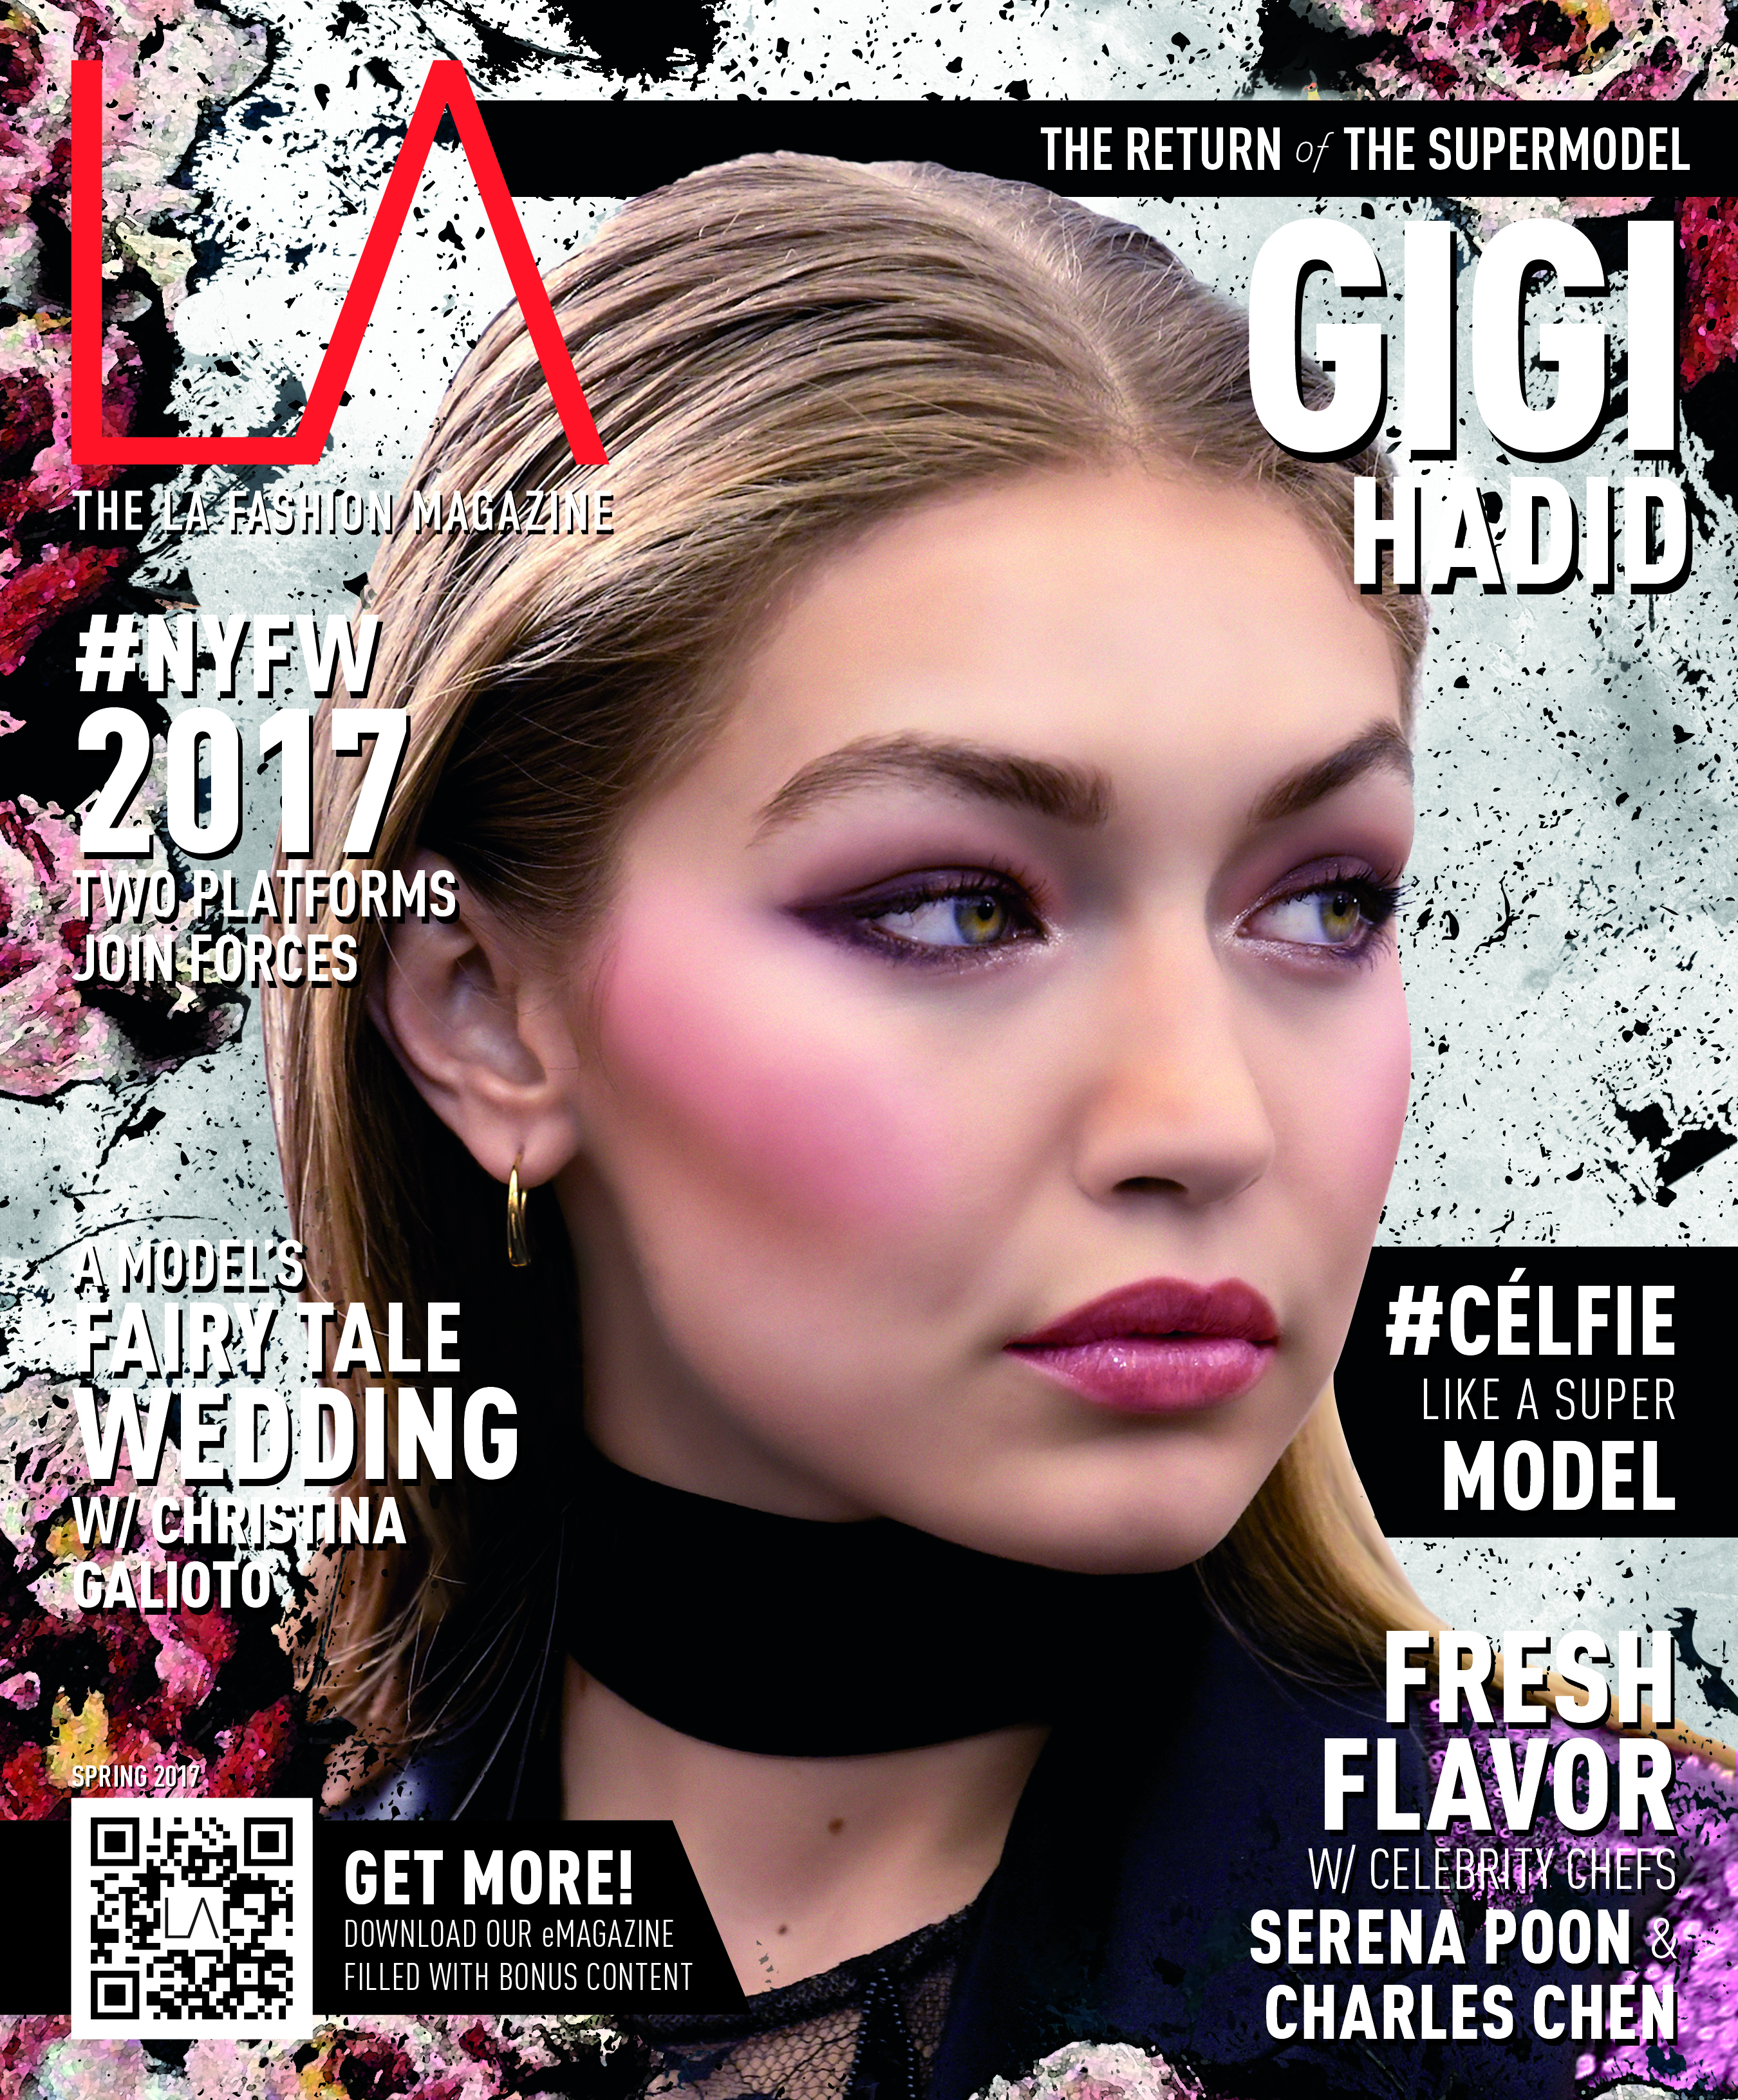 Top 10 Online Fashion Magazines Fashion-Tech BoF 47